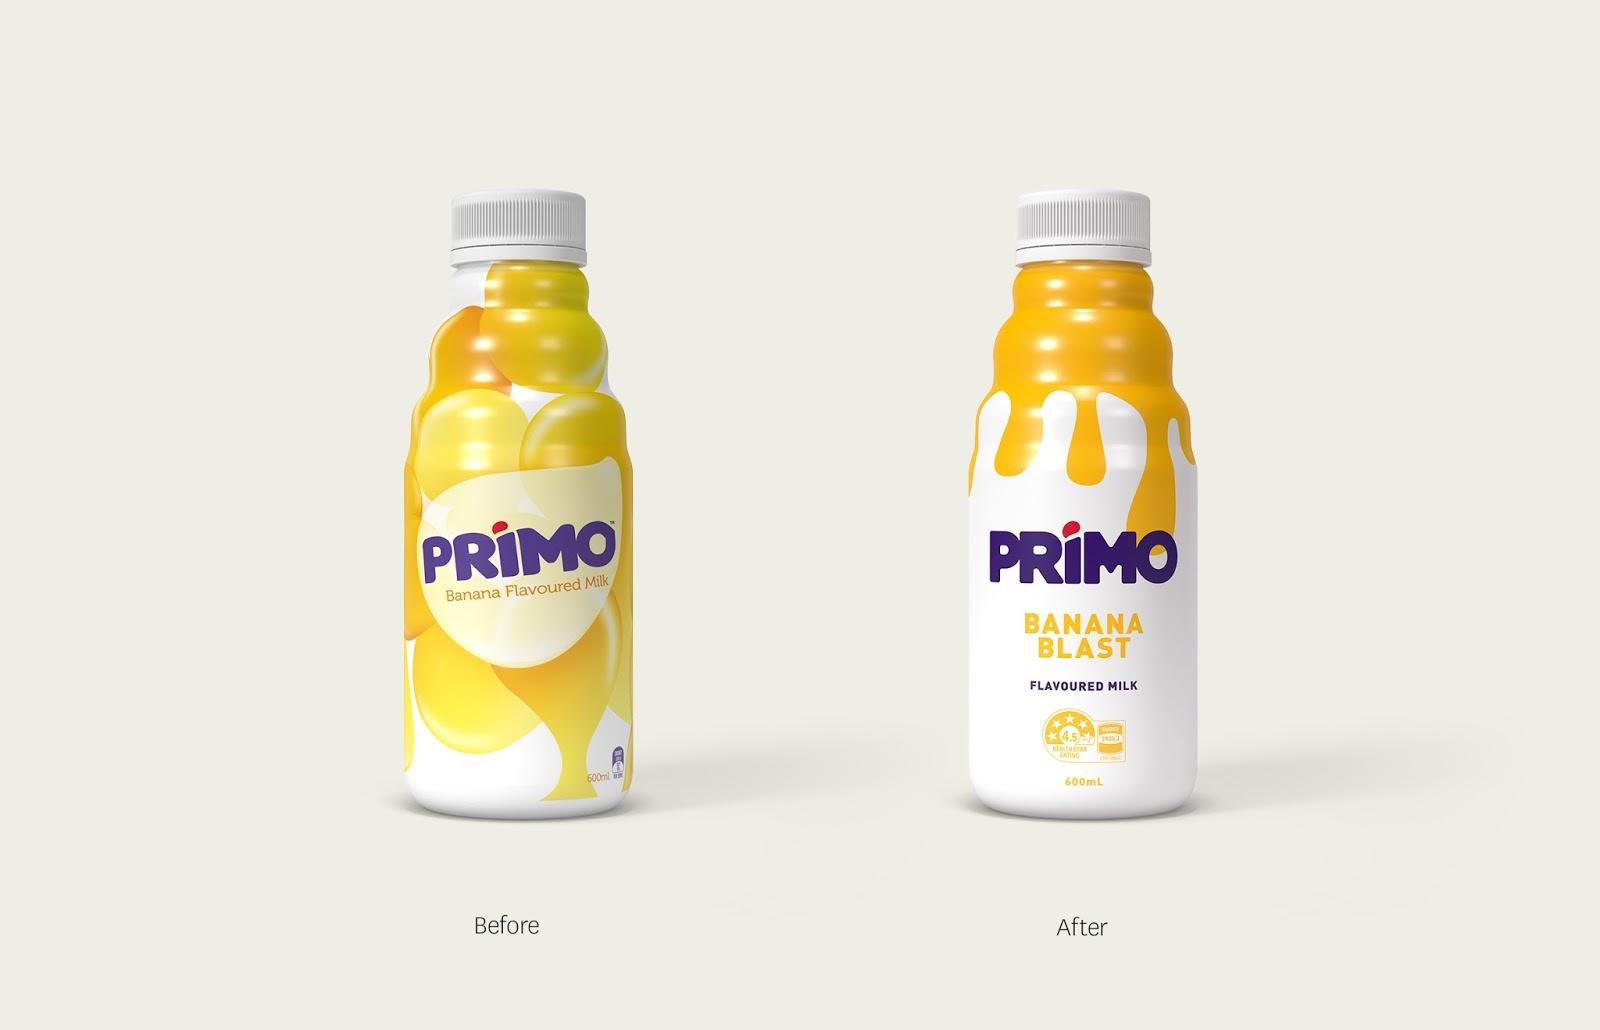 Primo饮料包装设计